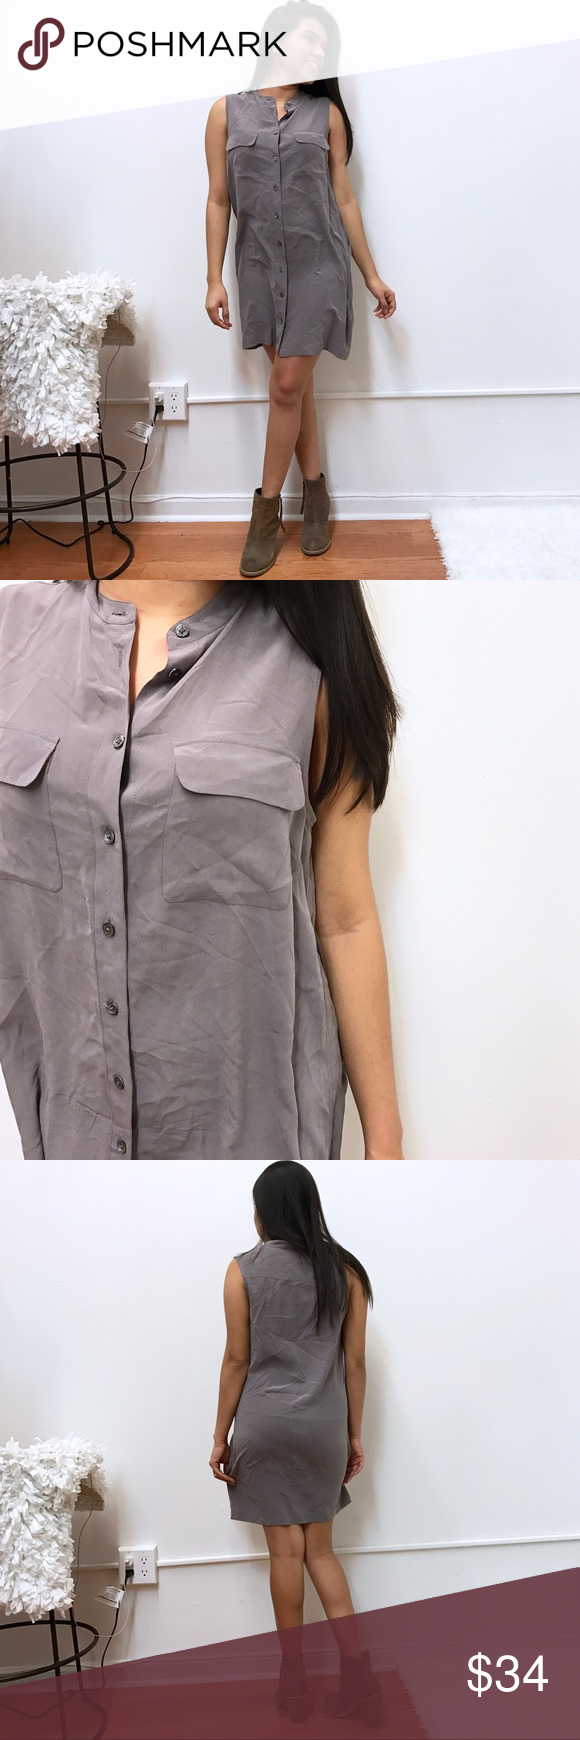 "Equipment silk Button Down dress S Small Equipment silk dress. Sz small. Great condition. Chest flat across 18"" length 32"" mauve color. Equipment Dresses"